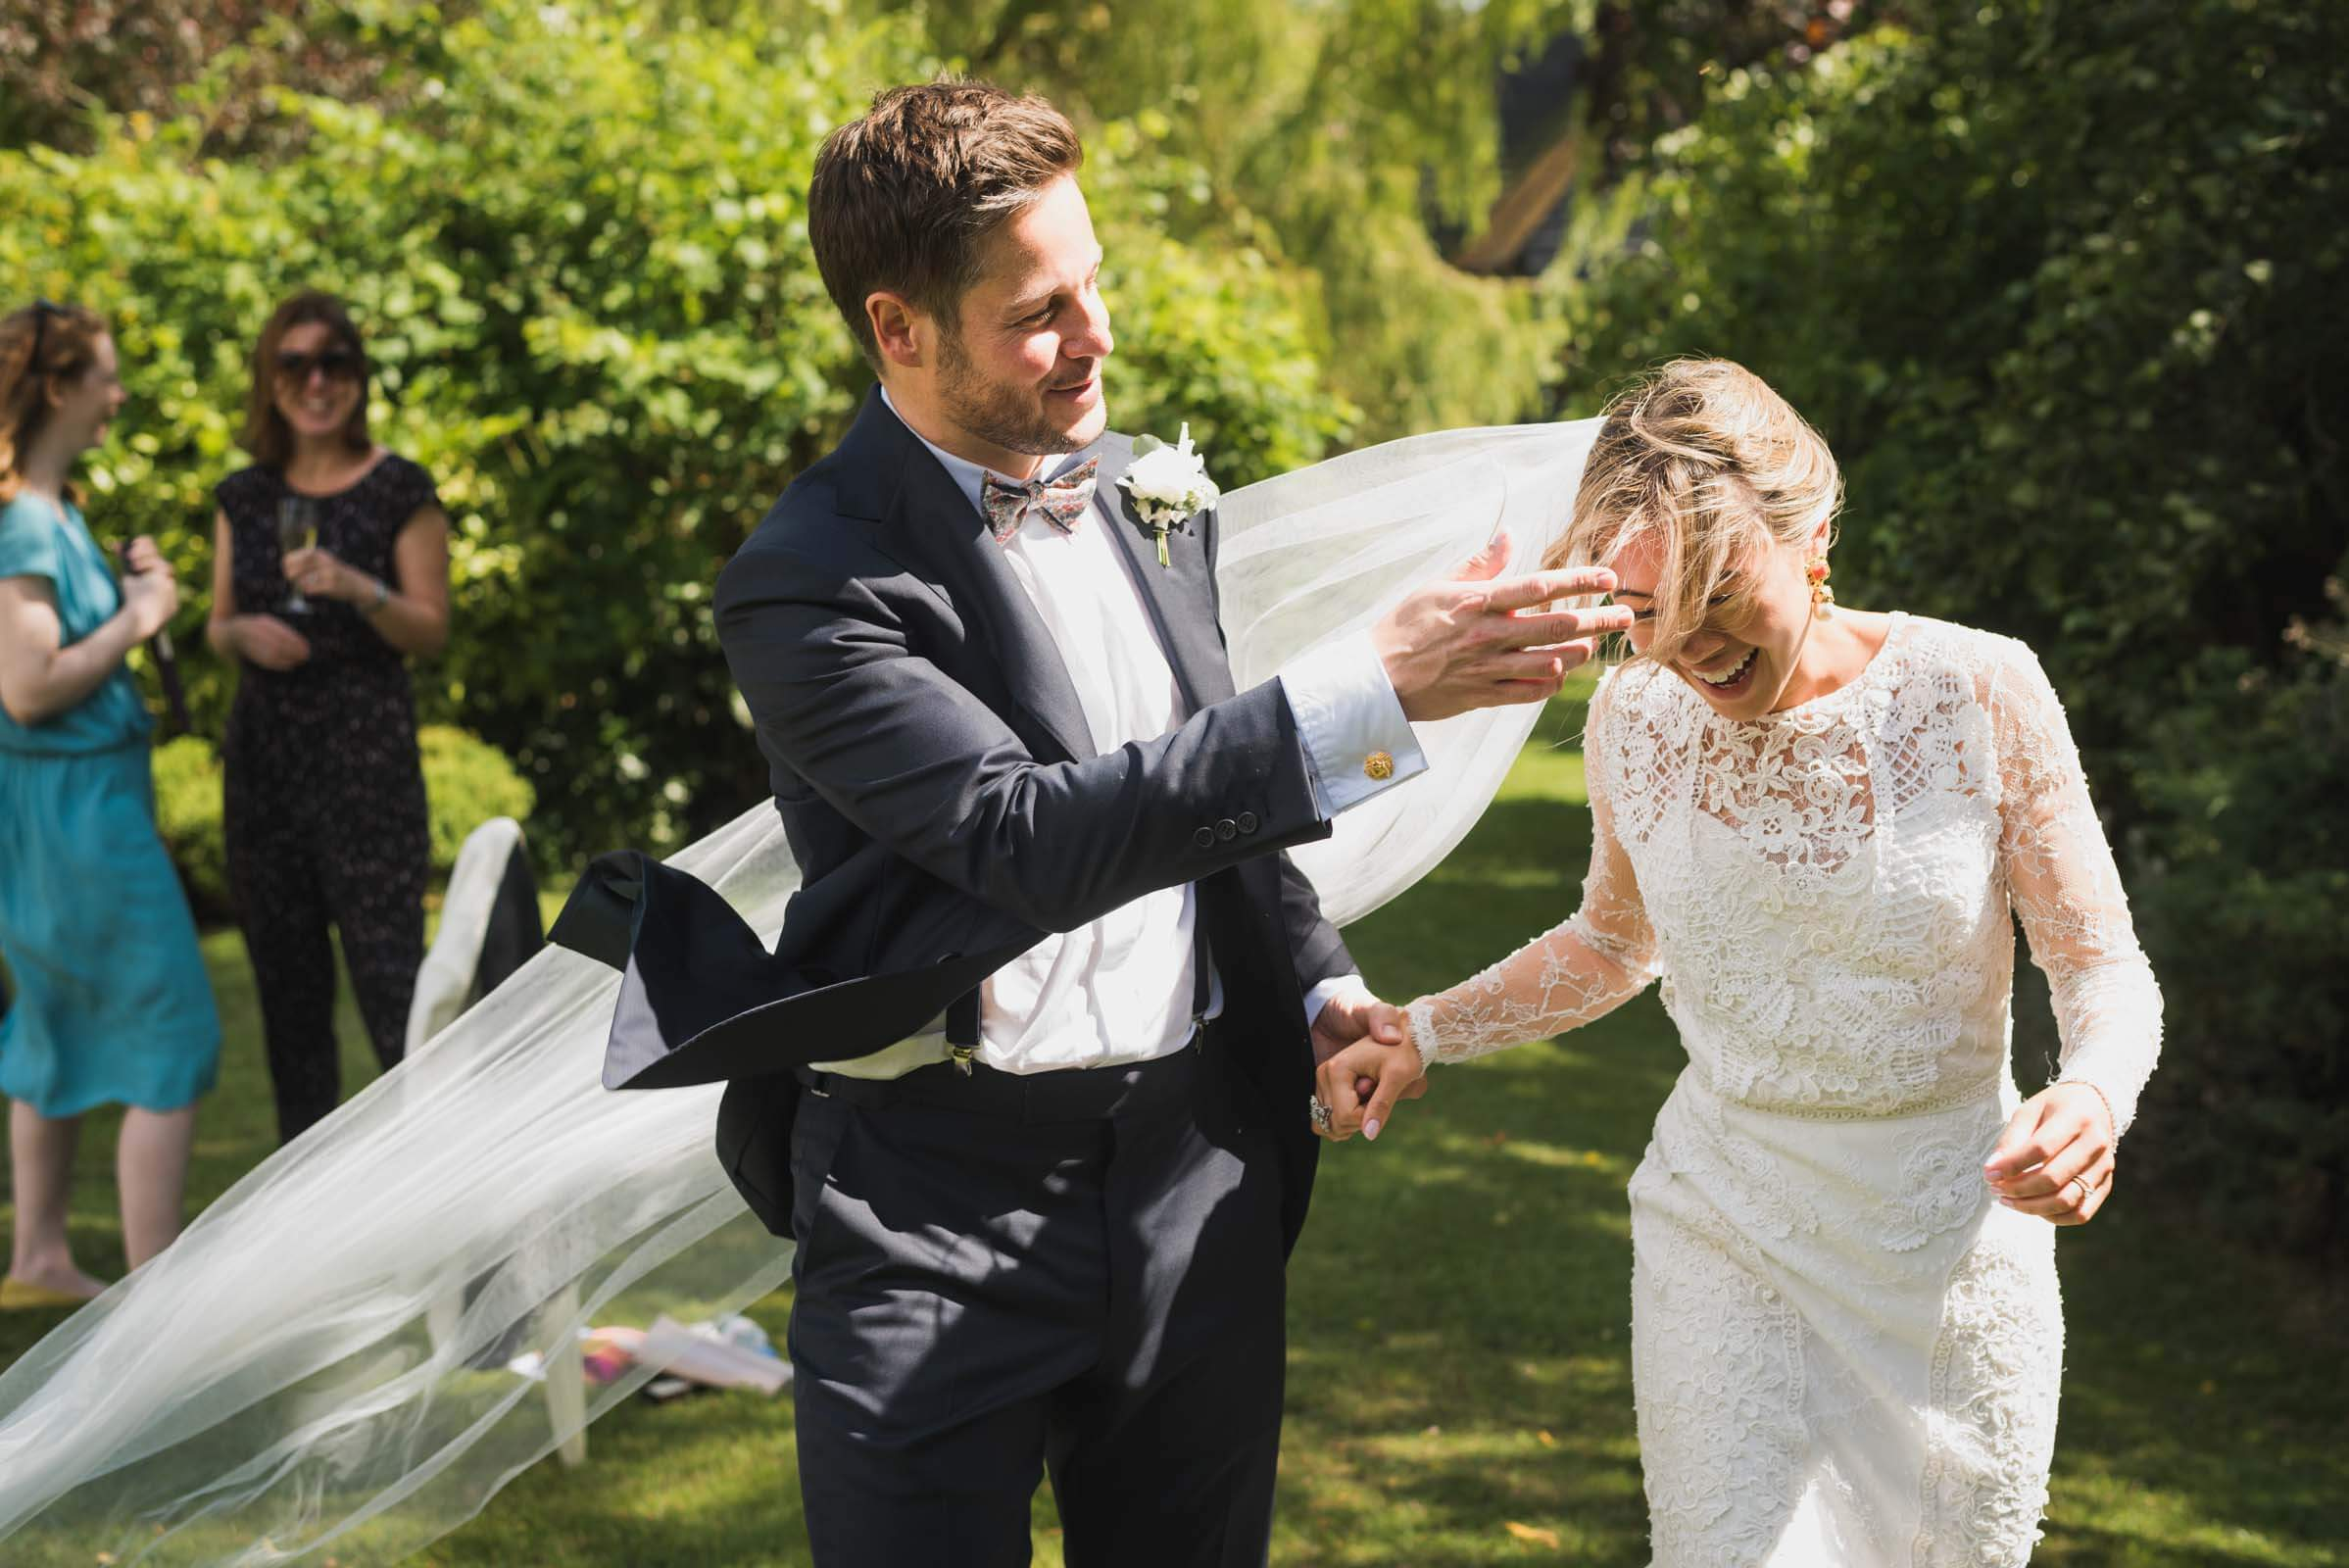 funny wedding couple at garden, Carine Bea Photography